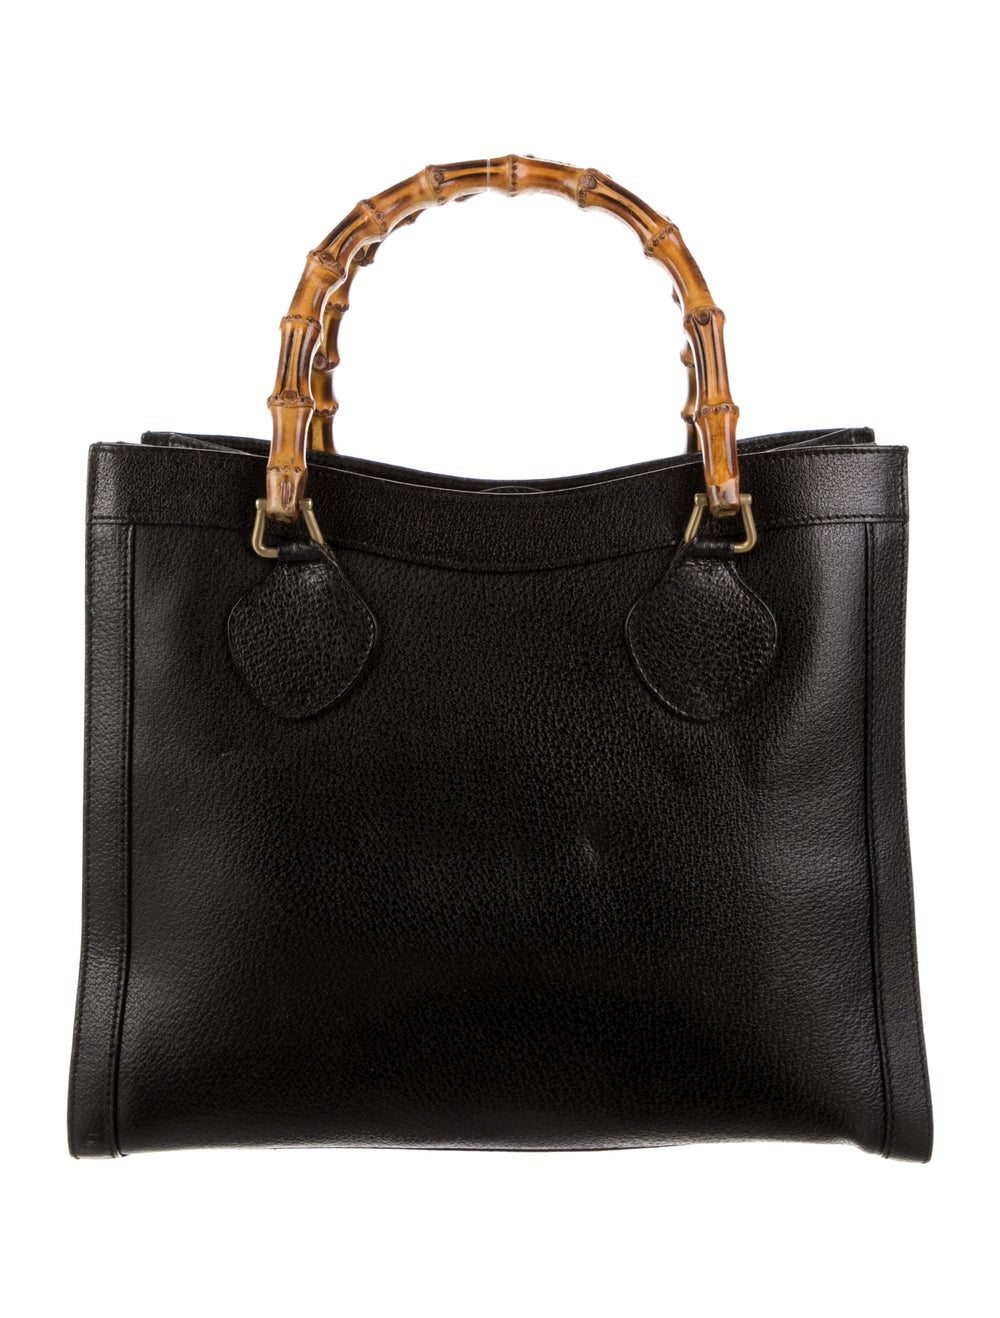 Gucci Vintage Diana Bamboo Tote Black - image 4